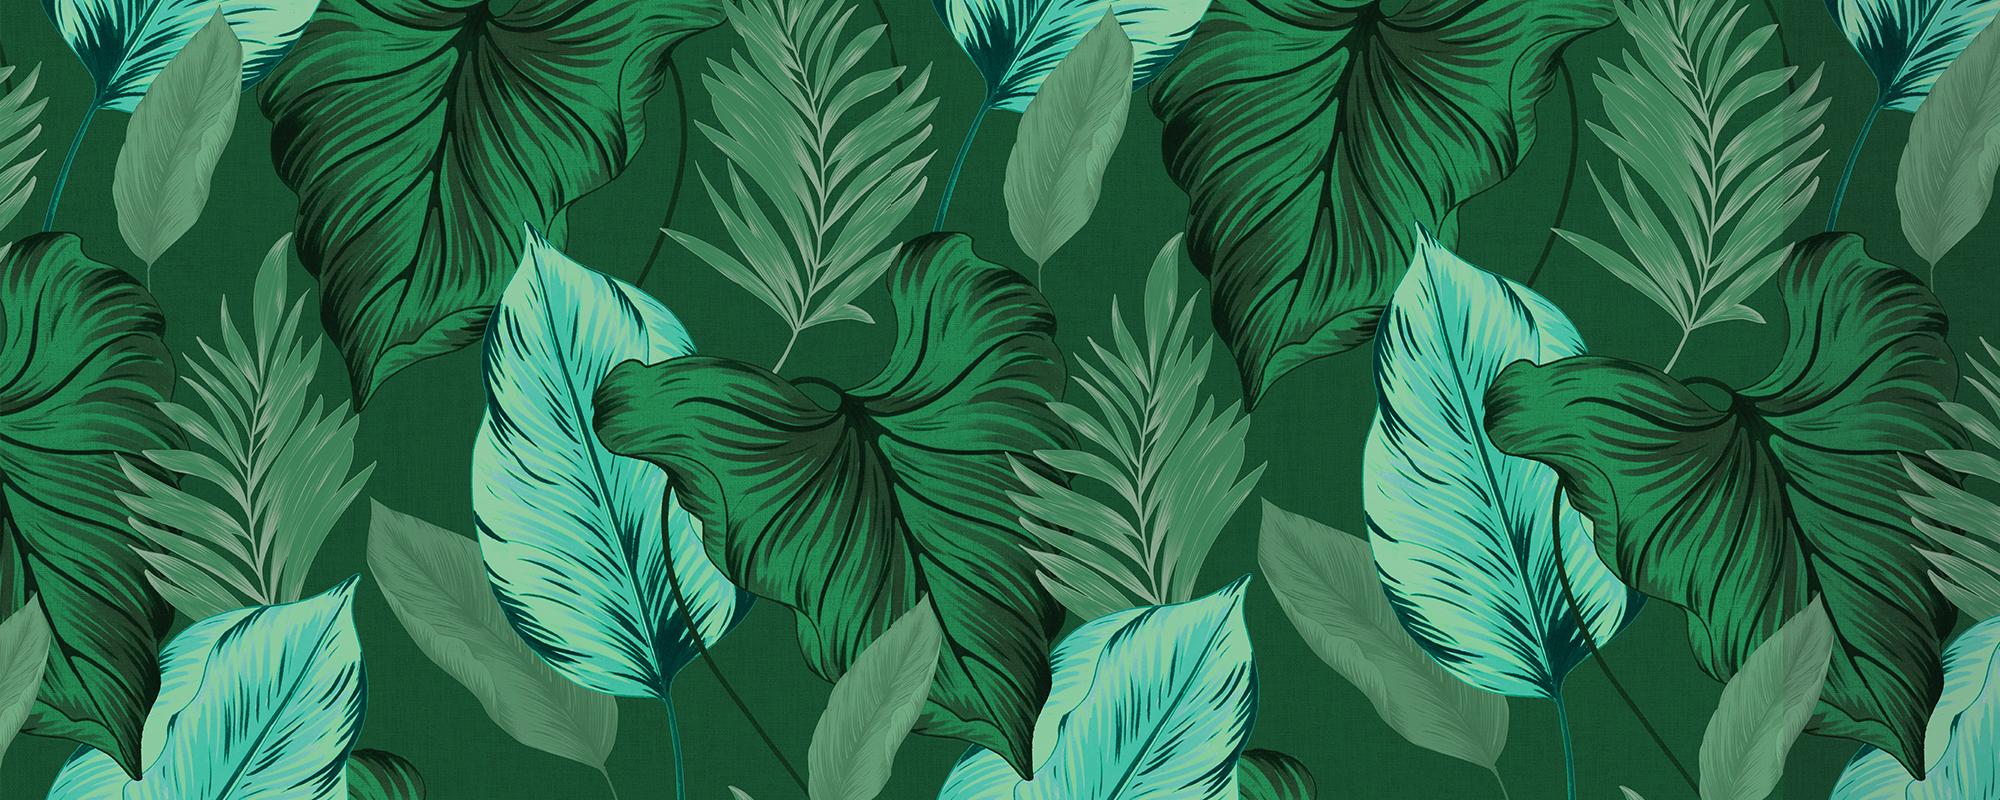 Papier peint feuillage tropical vert